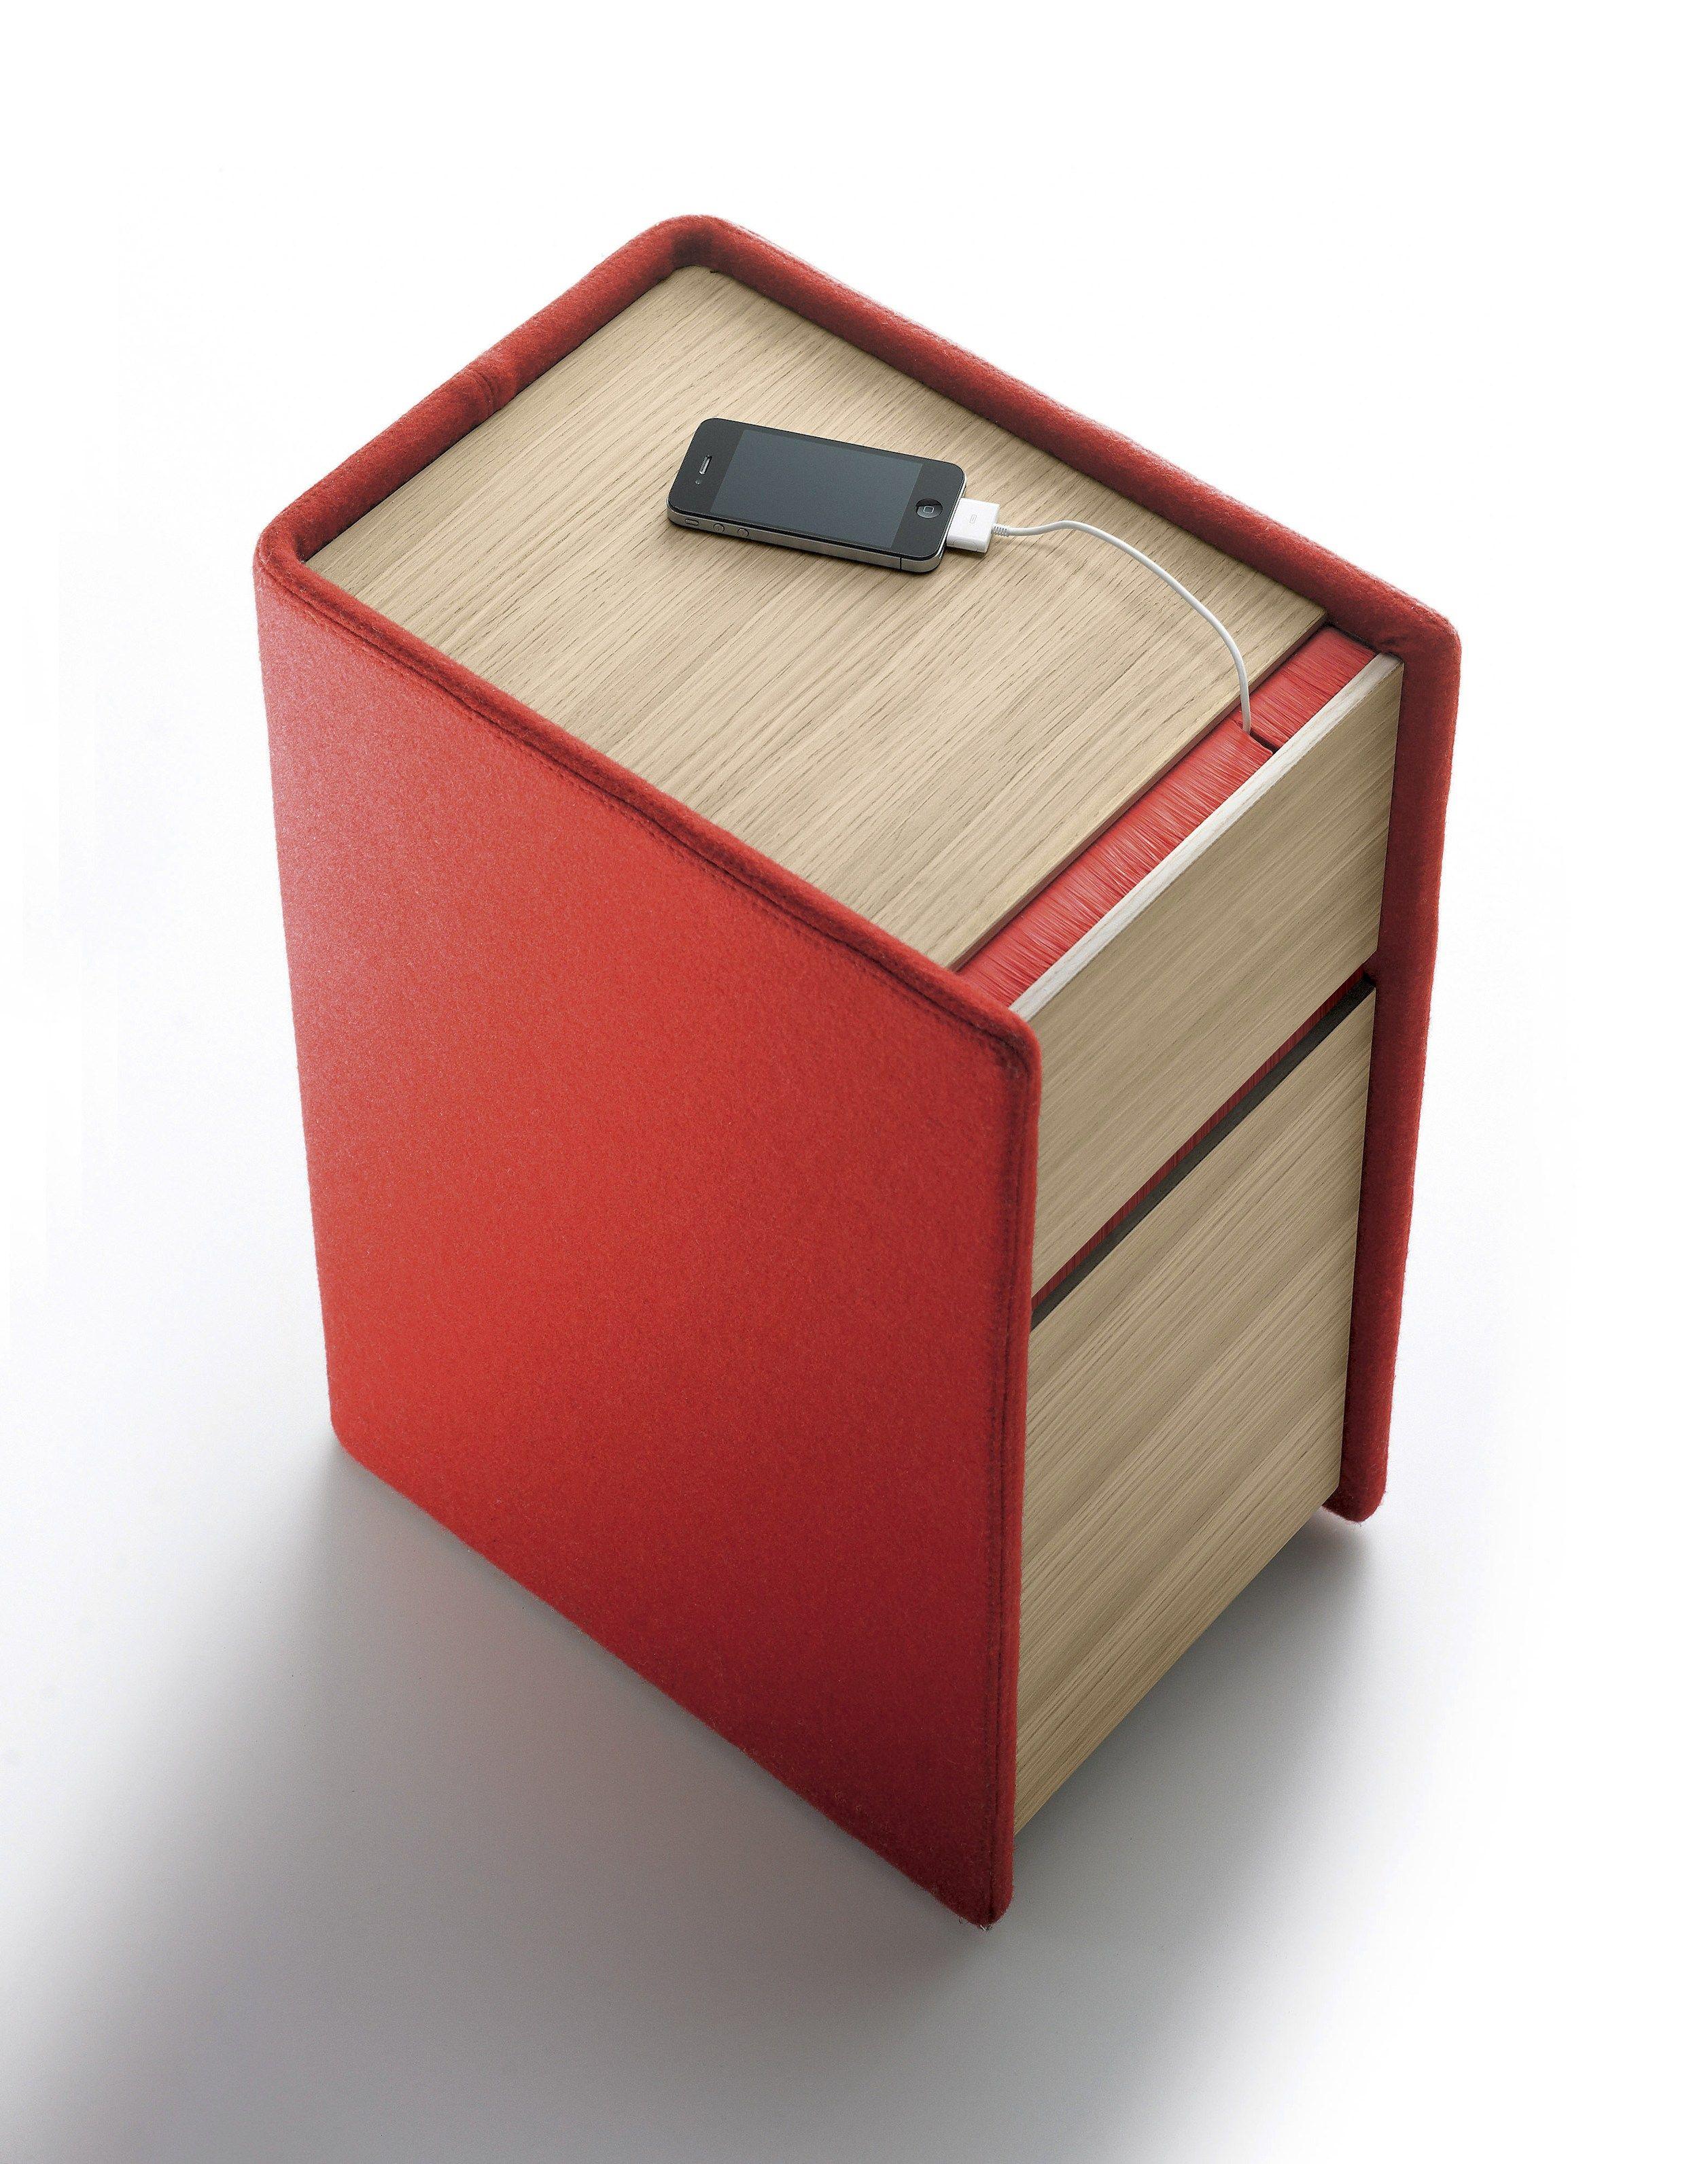 Mueble auxiliar de madera maciza con ruedas colecci n - Mueble auxiliar con ruedas ...